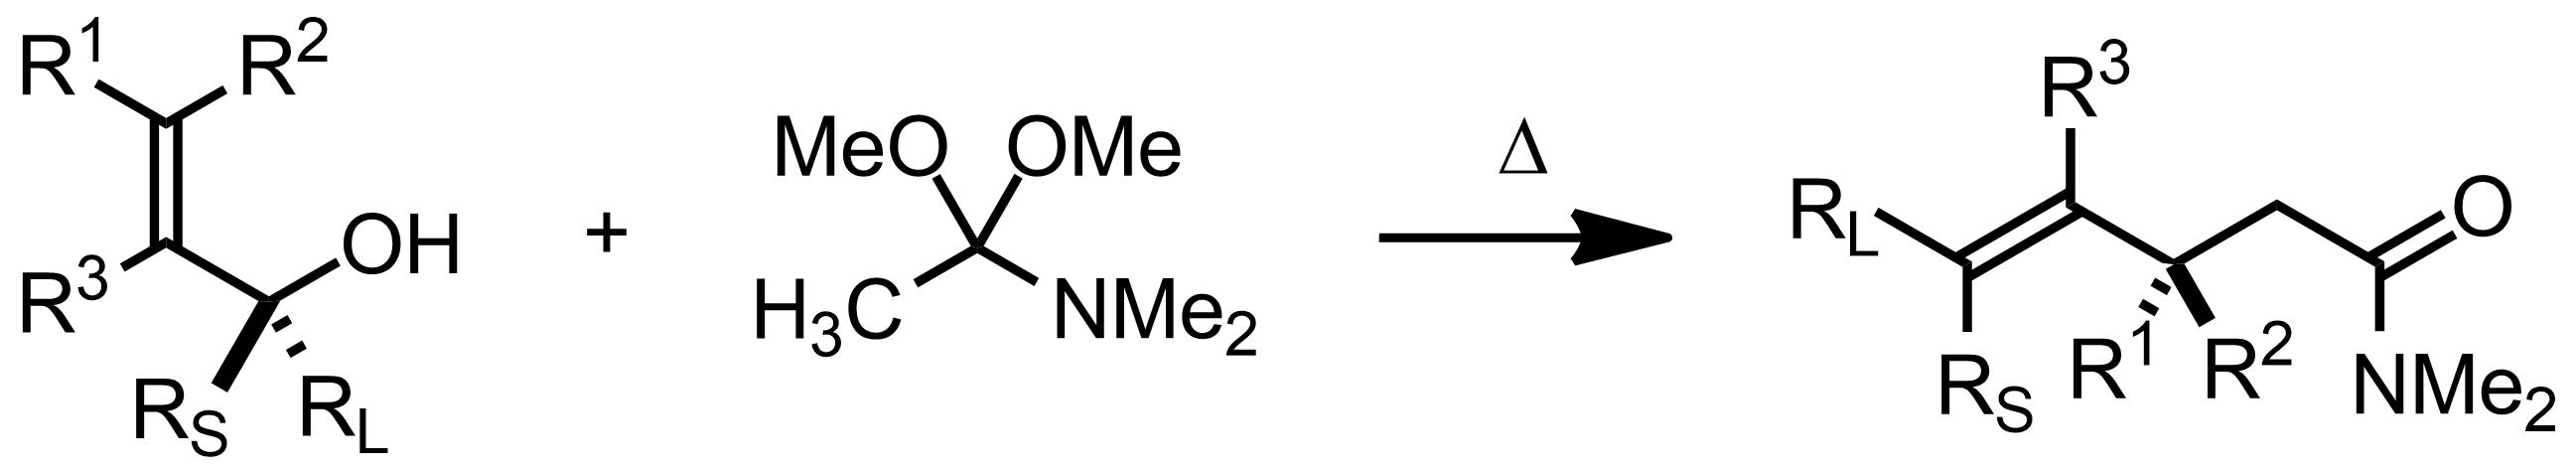 Schematic representation of the Eschenmoser-Claisen Rearrangement.